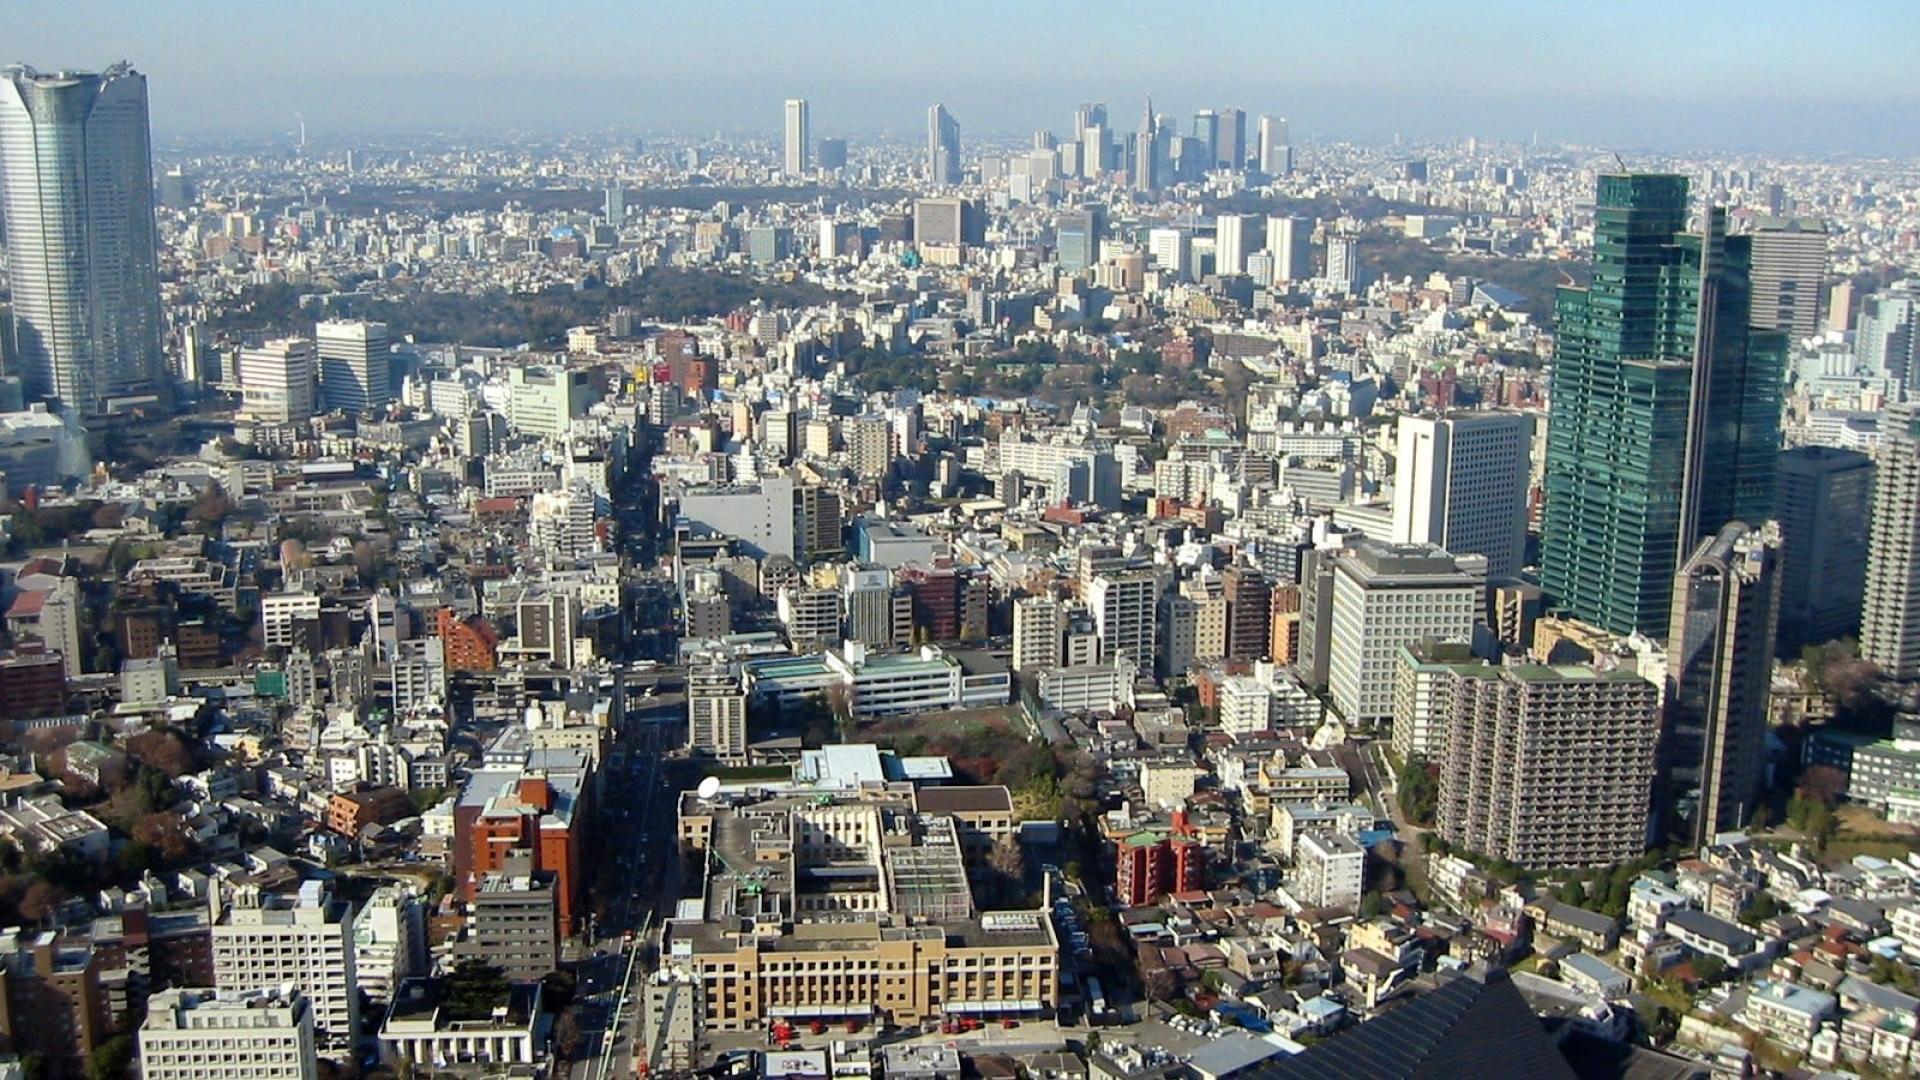 Tokyo Skyline Wallpaper High Quality As Wallpaper HD